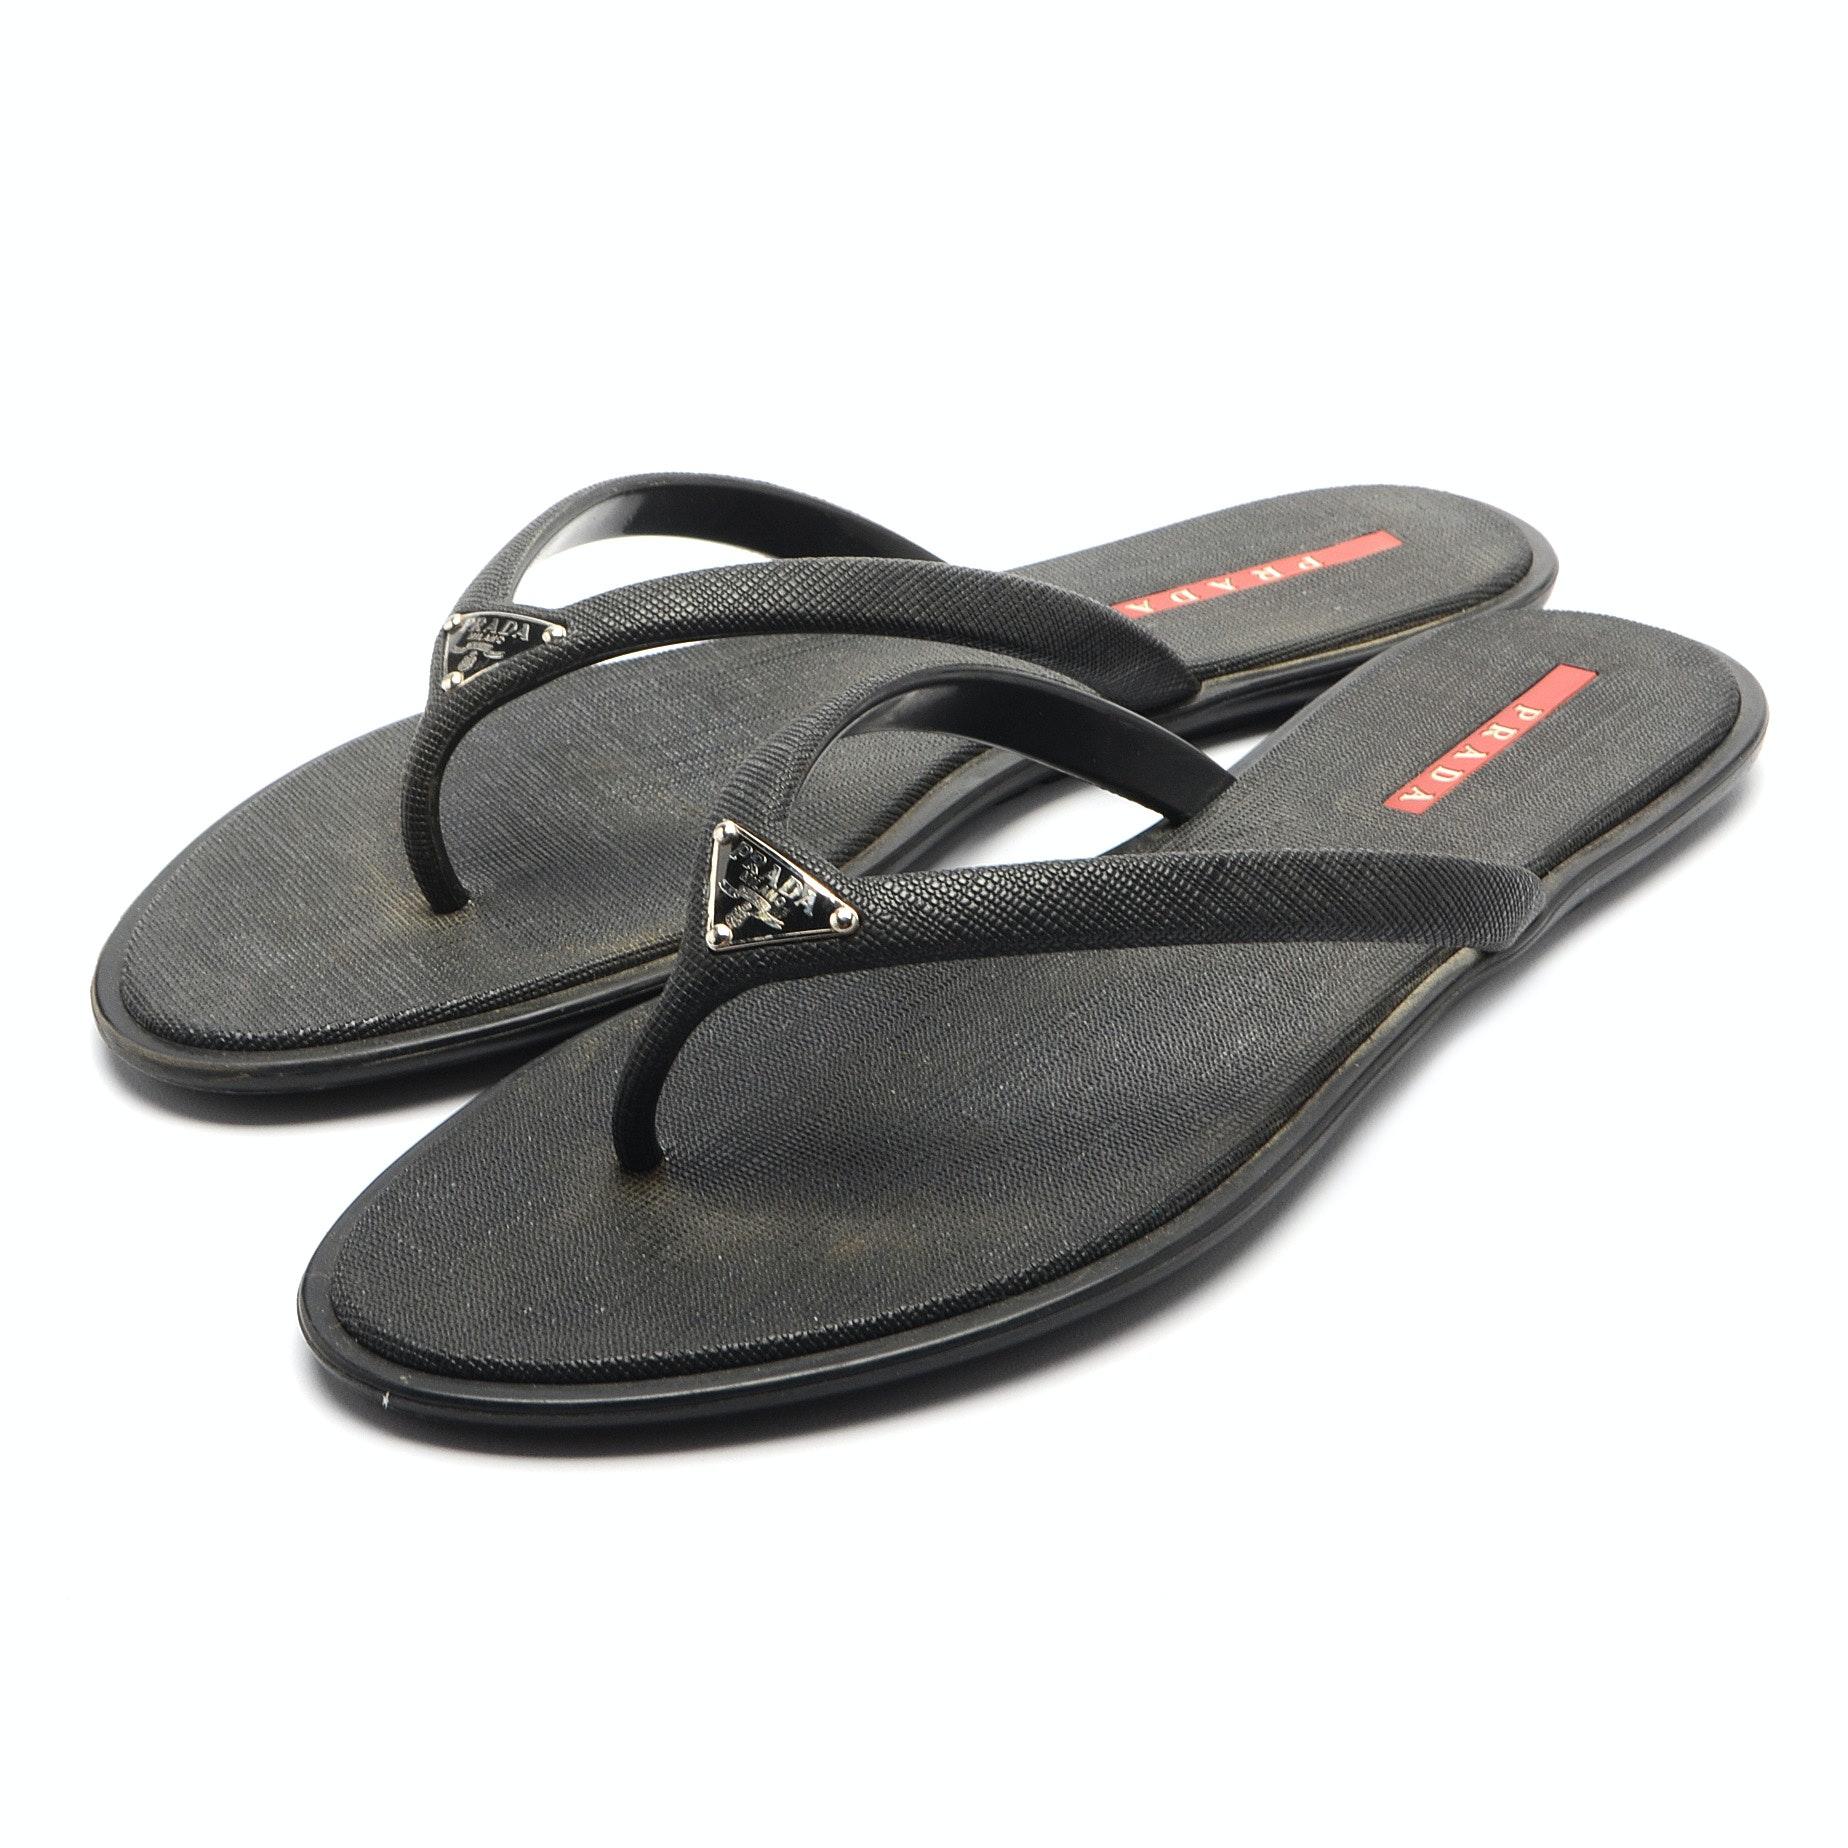 Prada Black Textured Vinyl Sandals